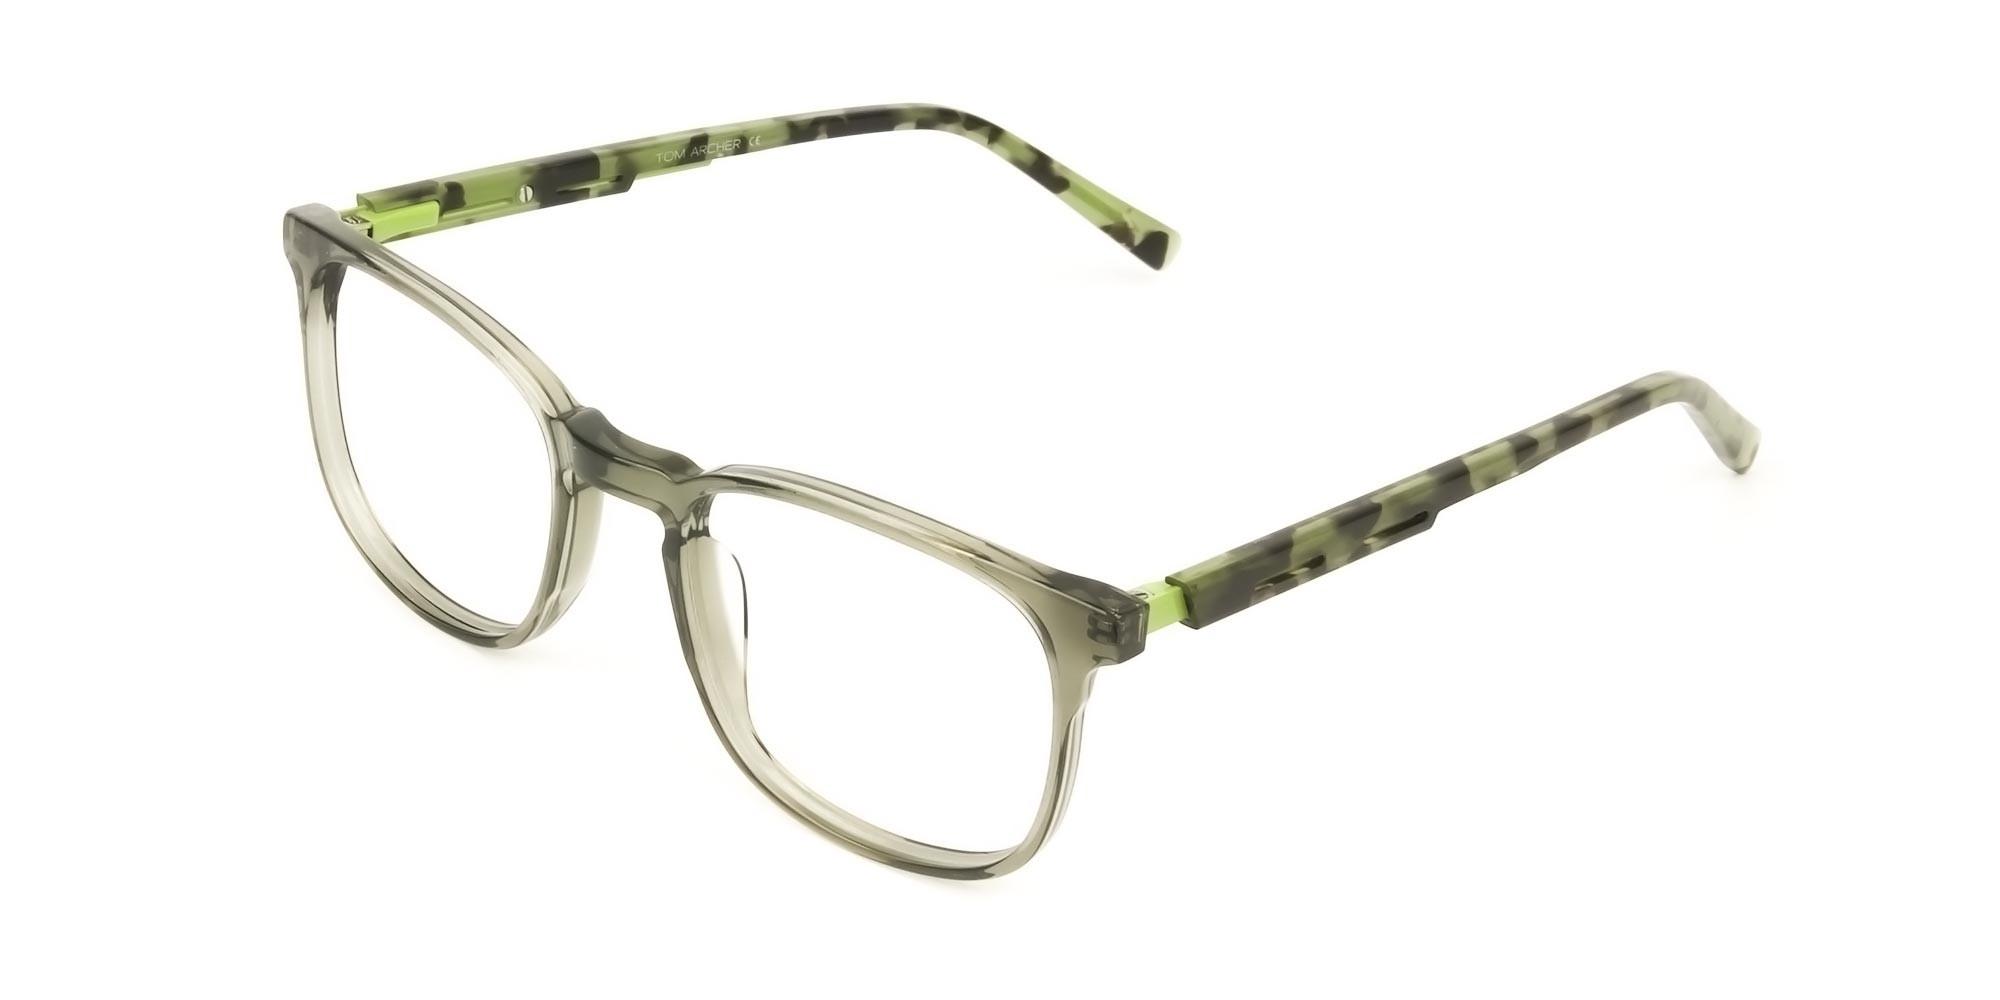 Translucent Camouflage & Olive Green Square Glasses - 3